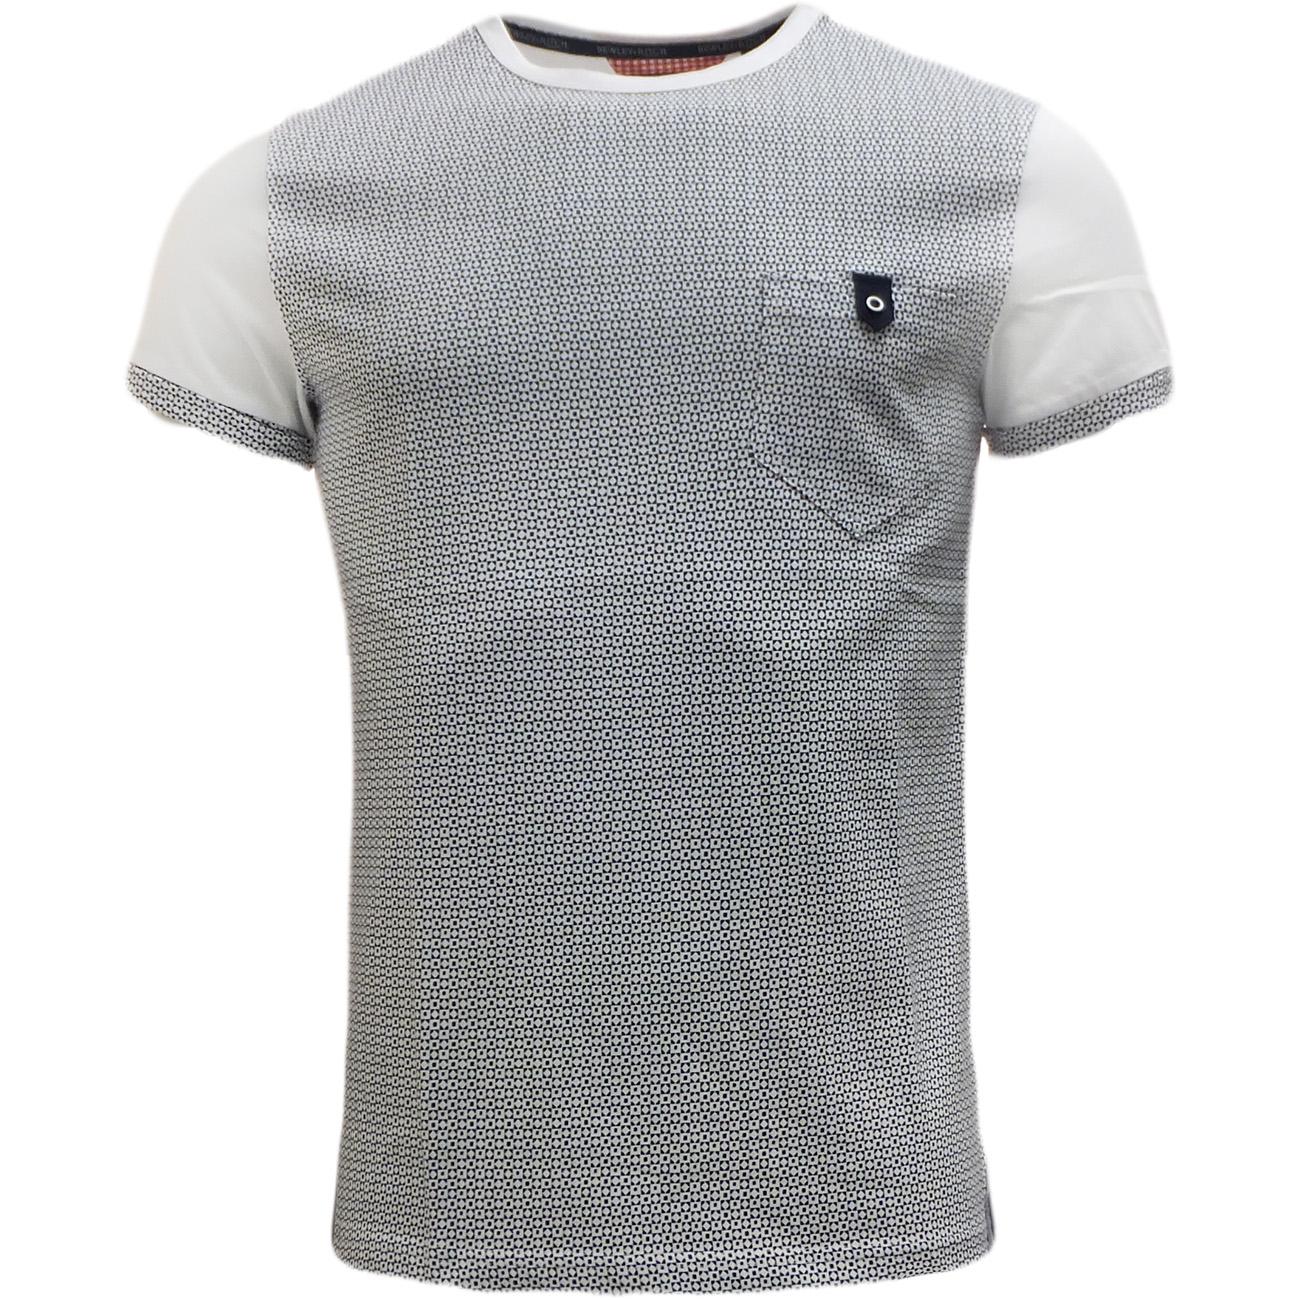 Bewley Ritch Mens T-Shirt - Pattern Pocket T Shirts 'Faxton'